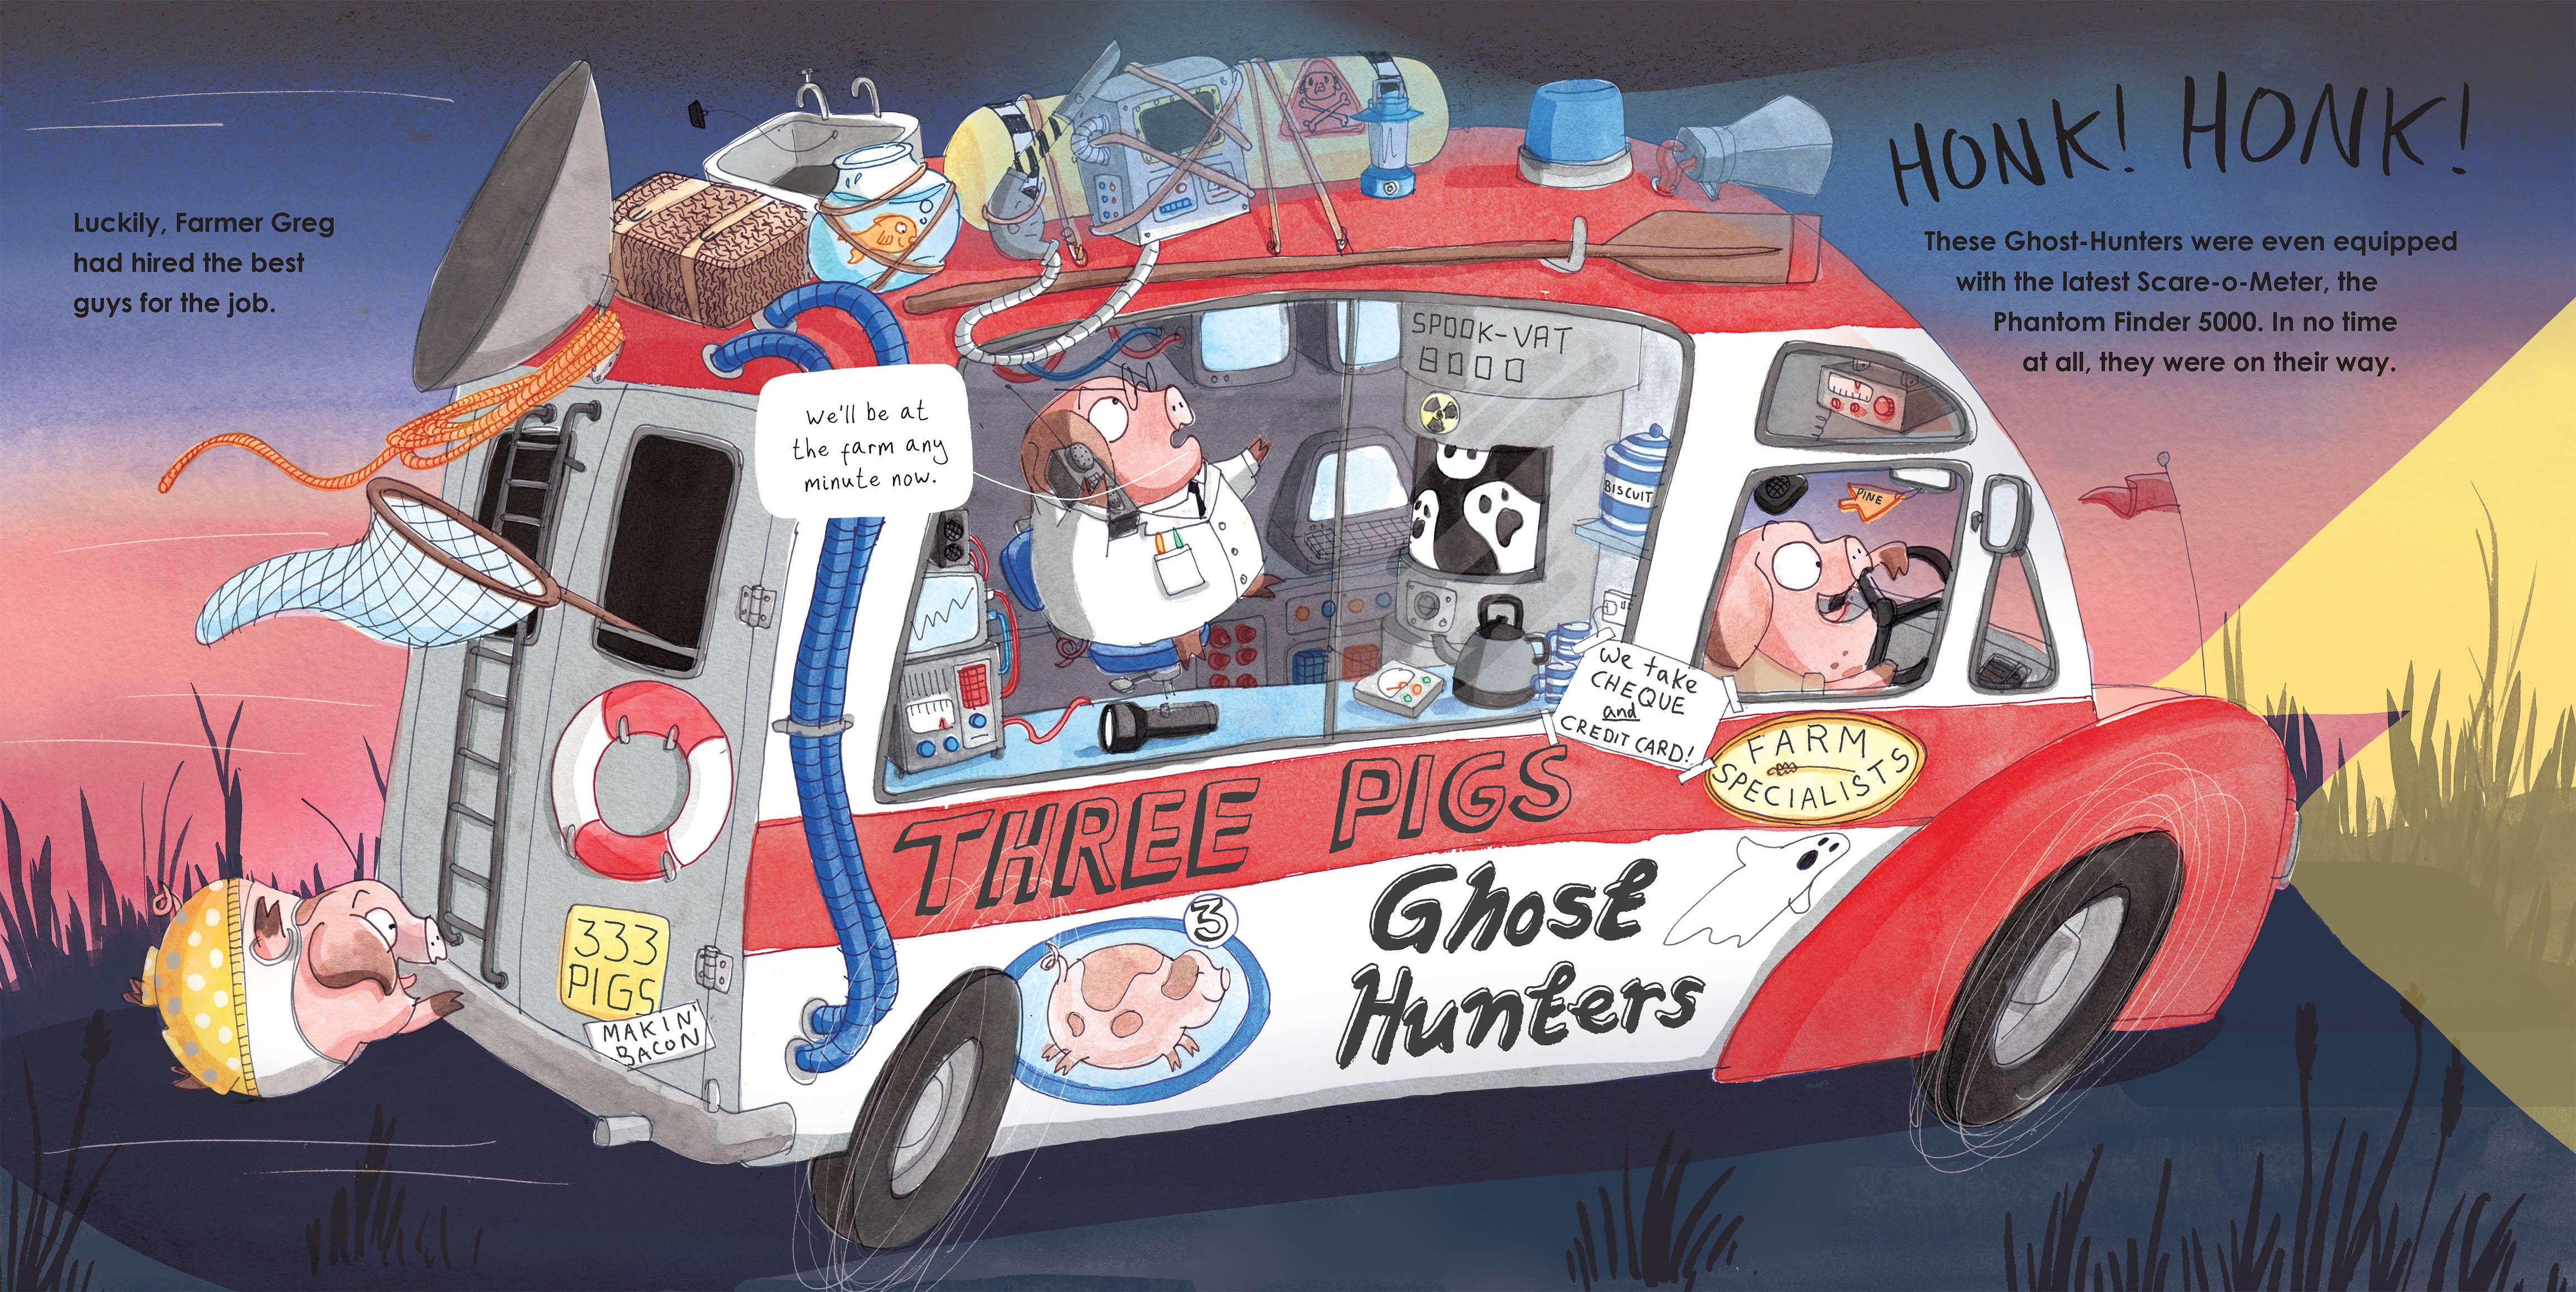 3 pig mobile